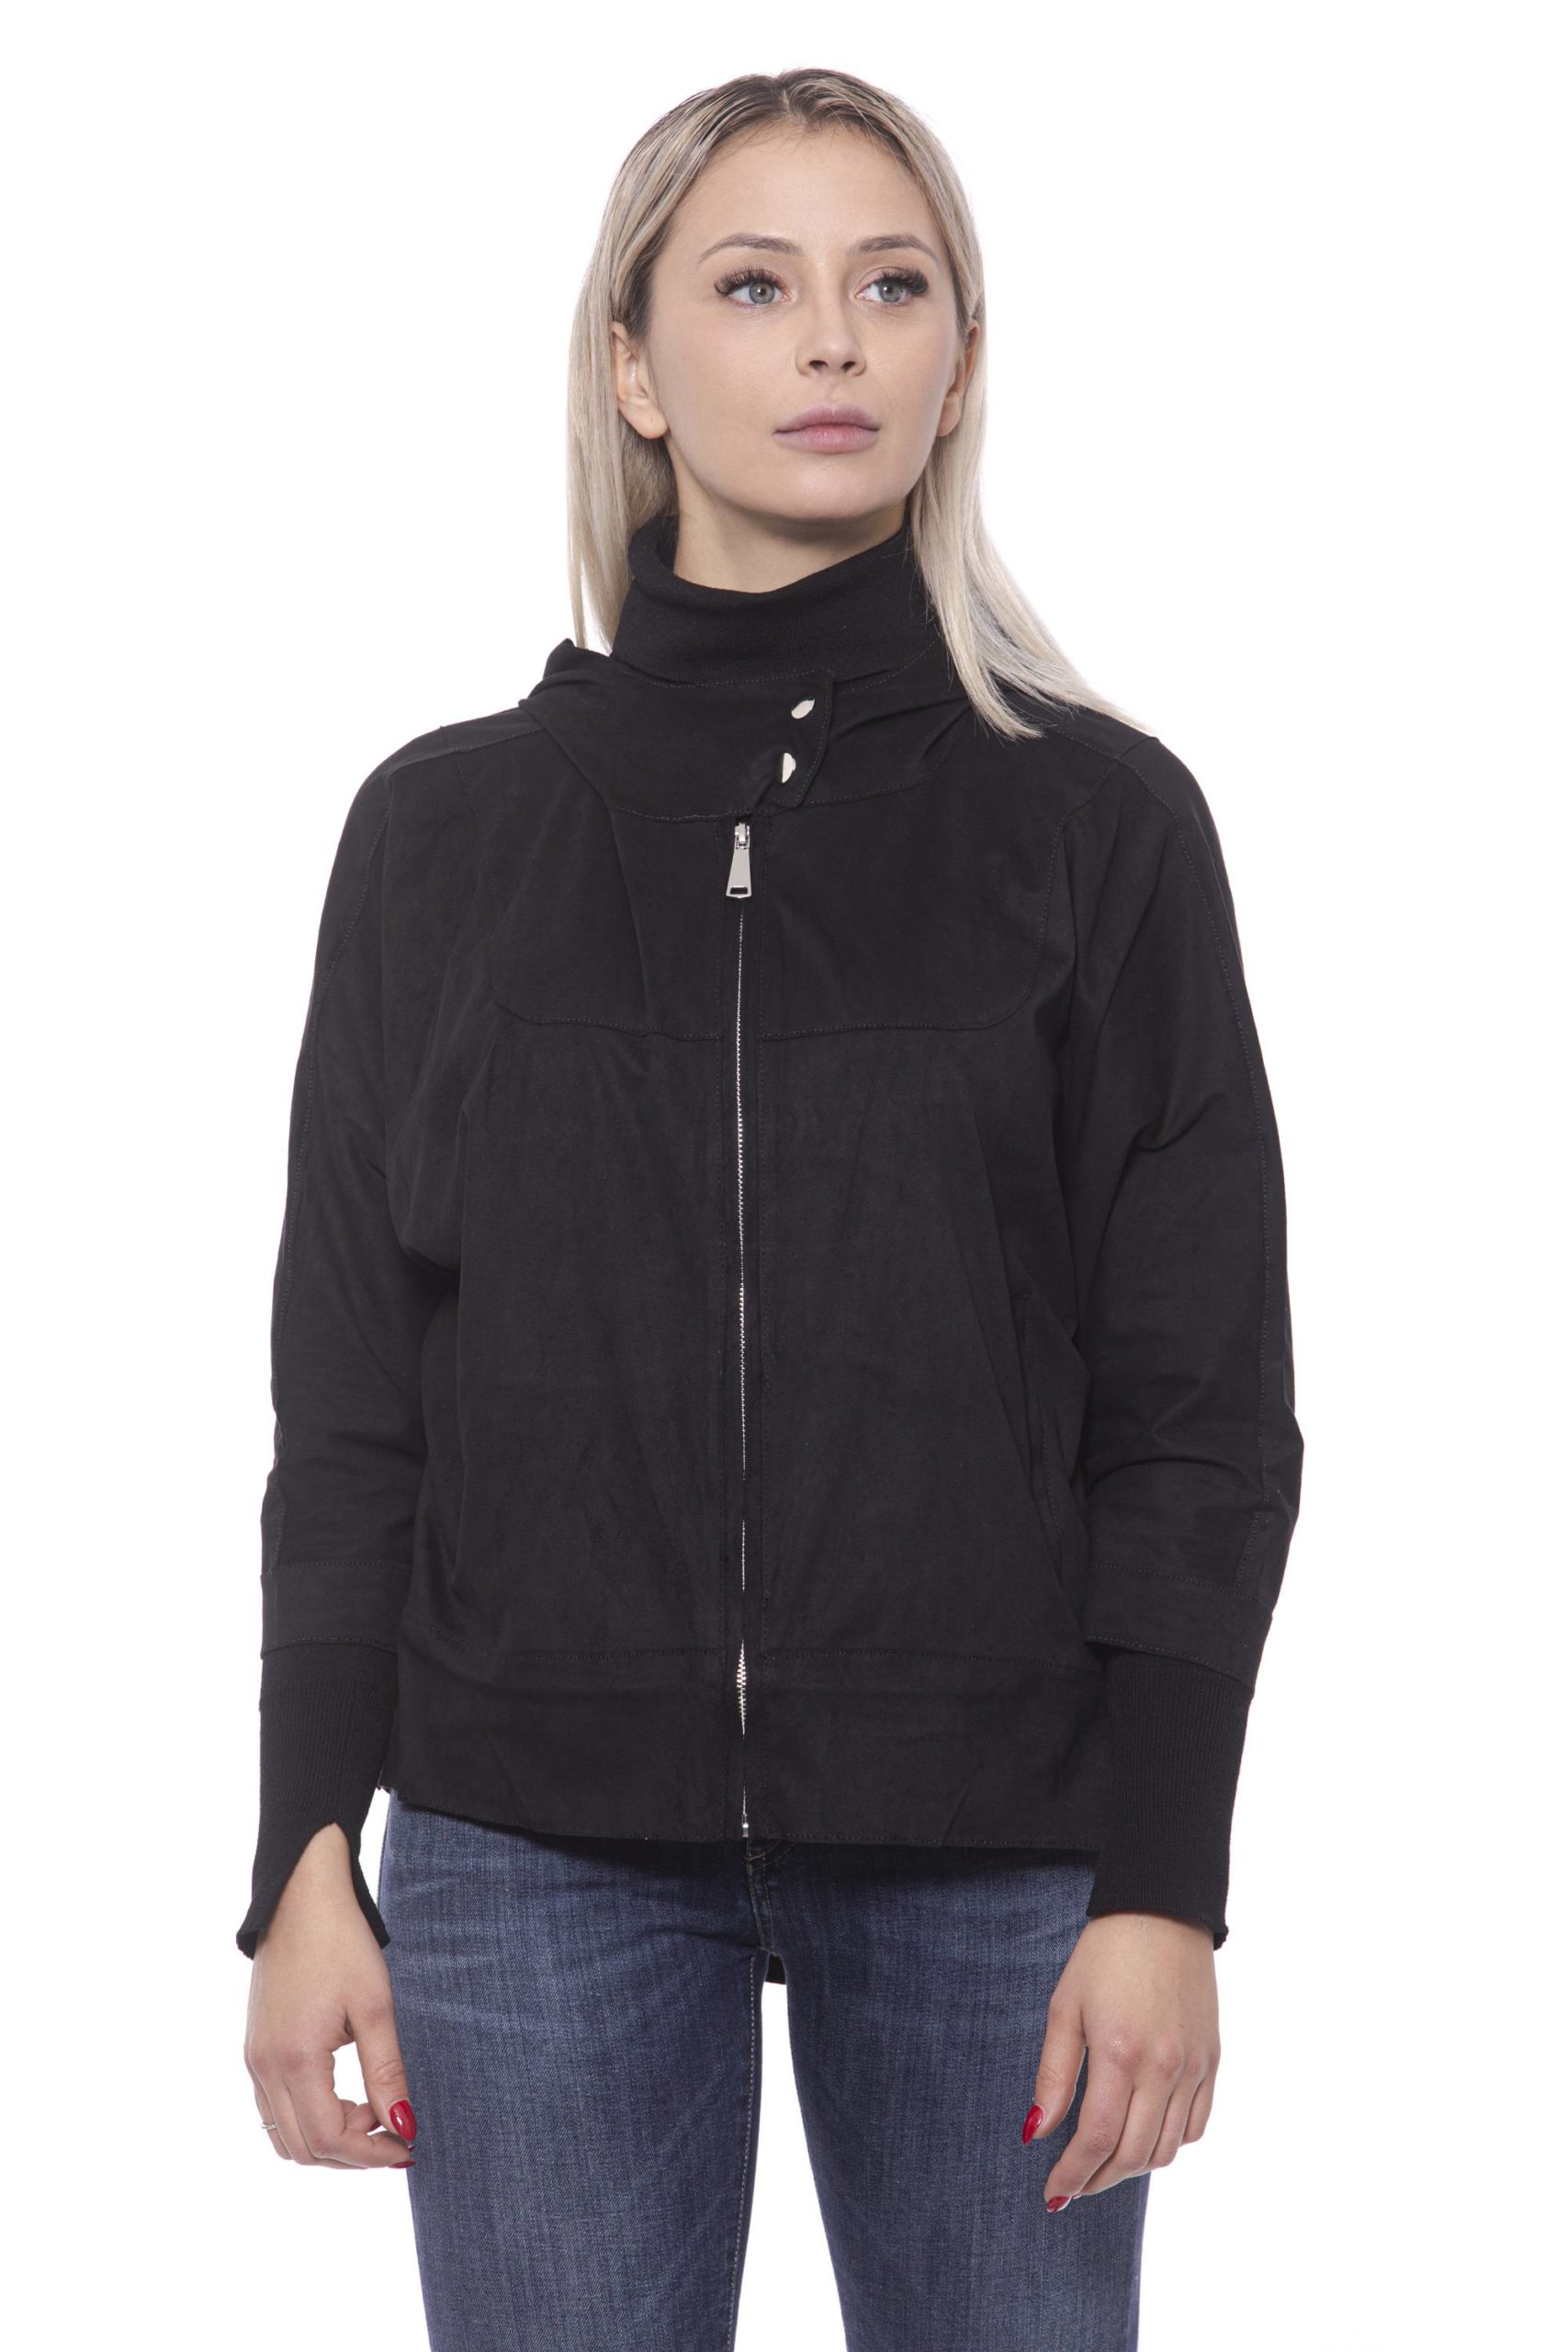 19V69 Italia Women's Nero Jacket 191388481 - IT42 | S